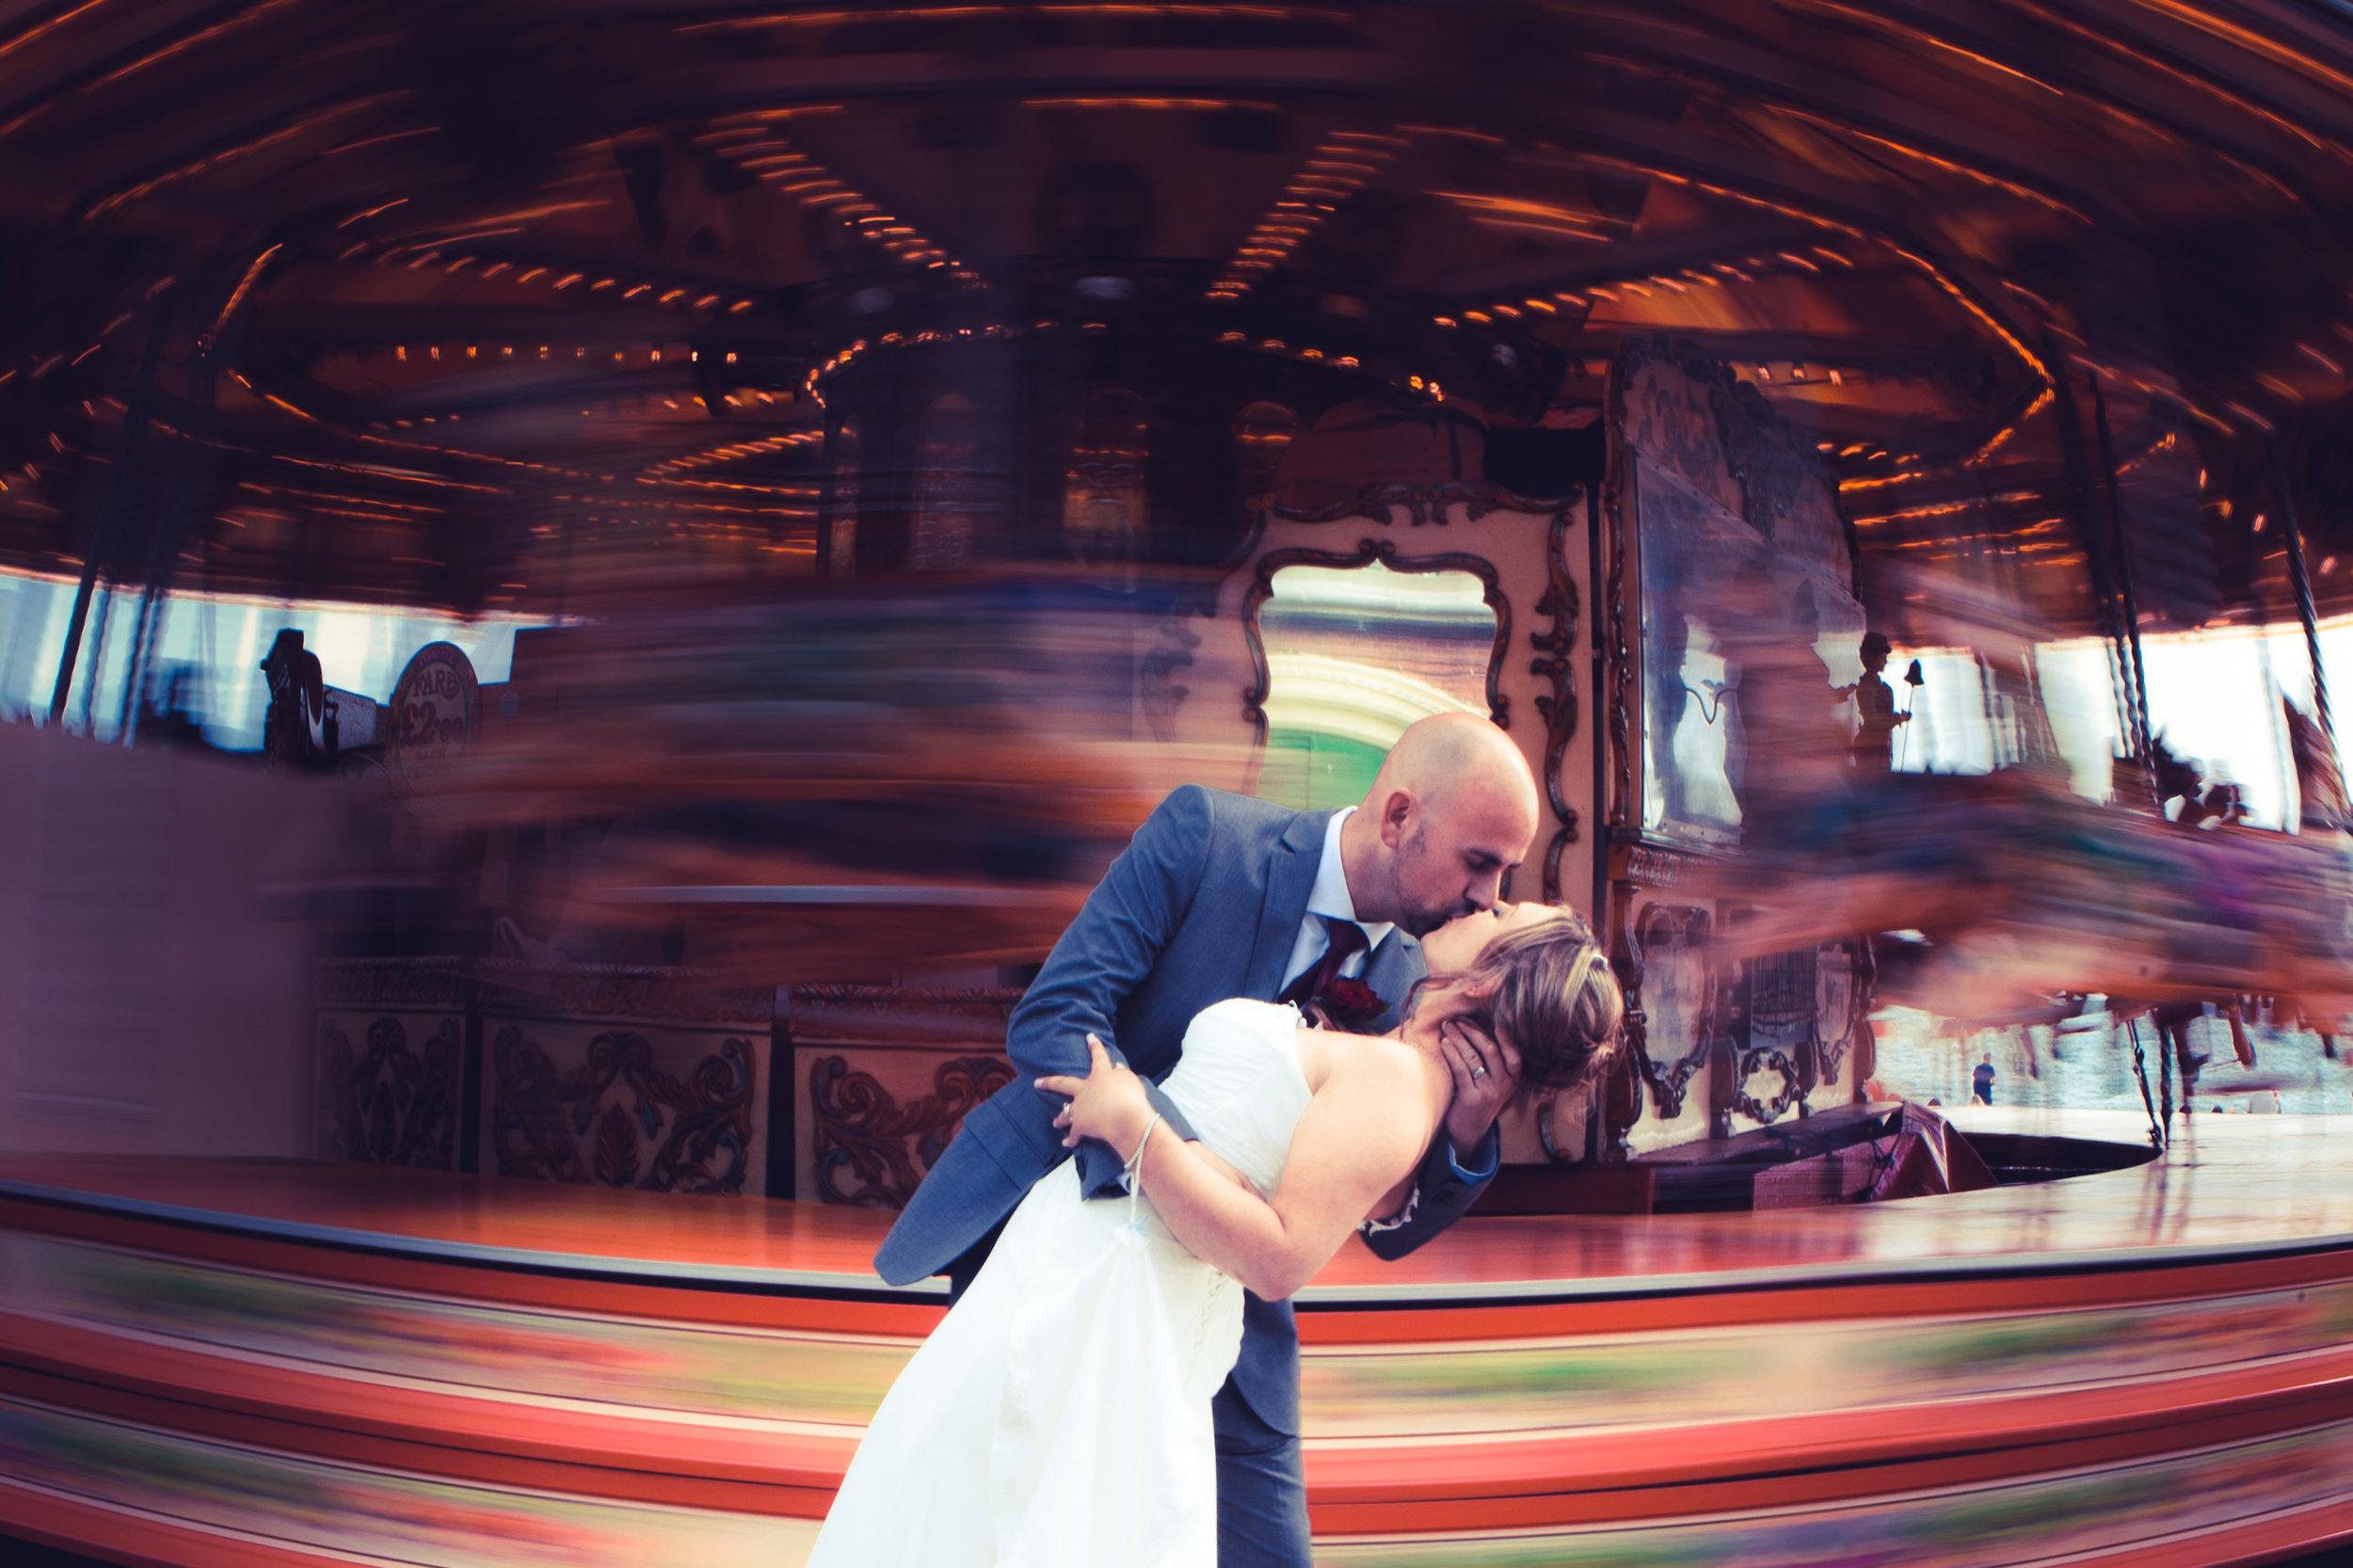 dan_burman_wedding_photography (11).JPG